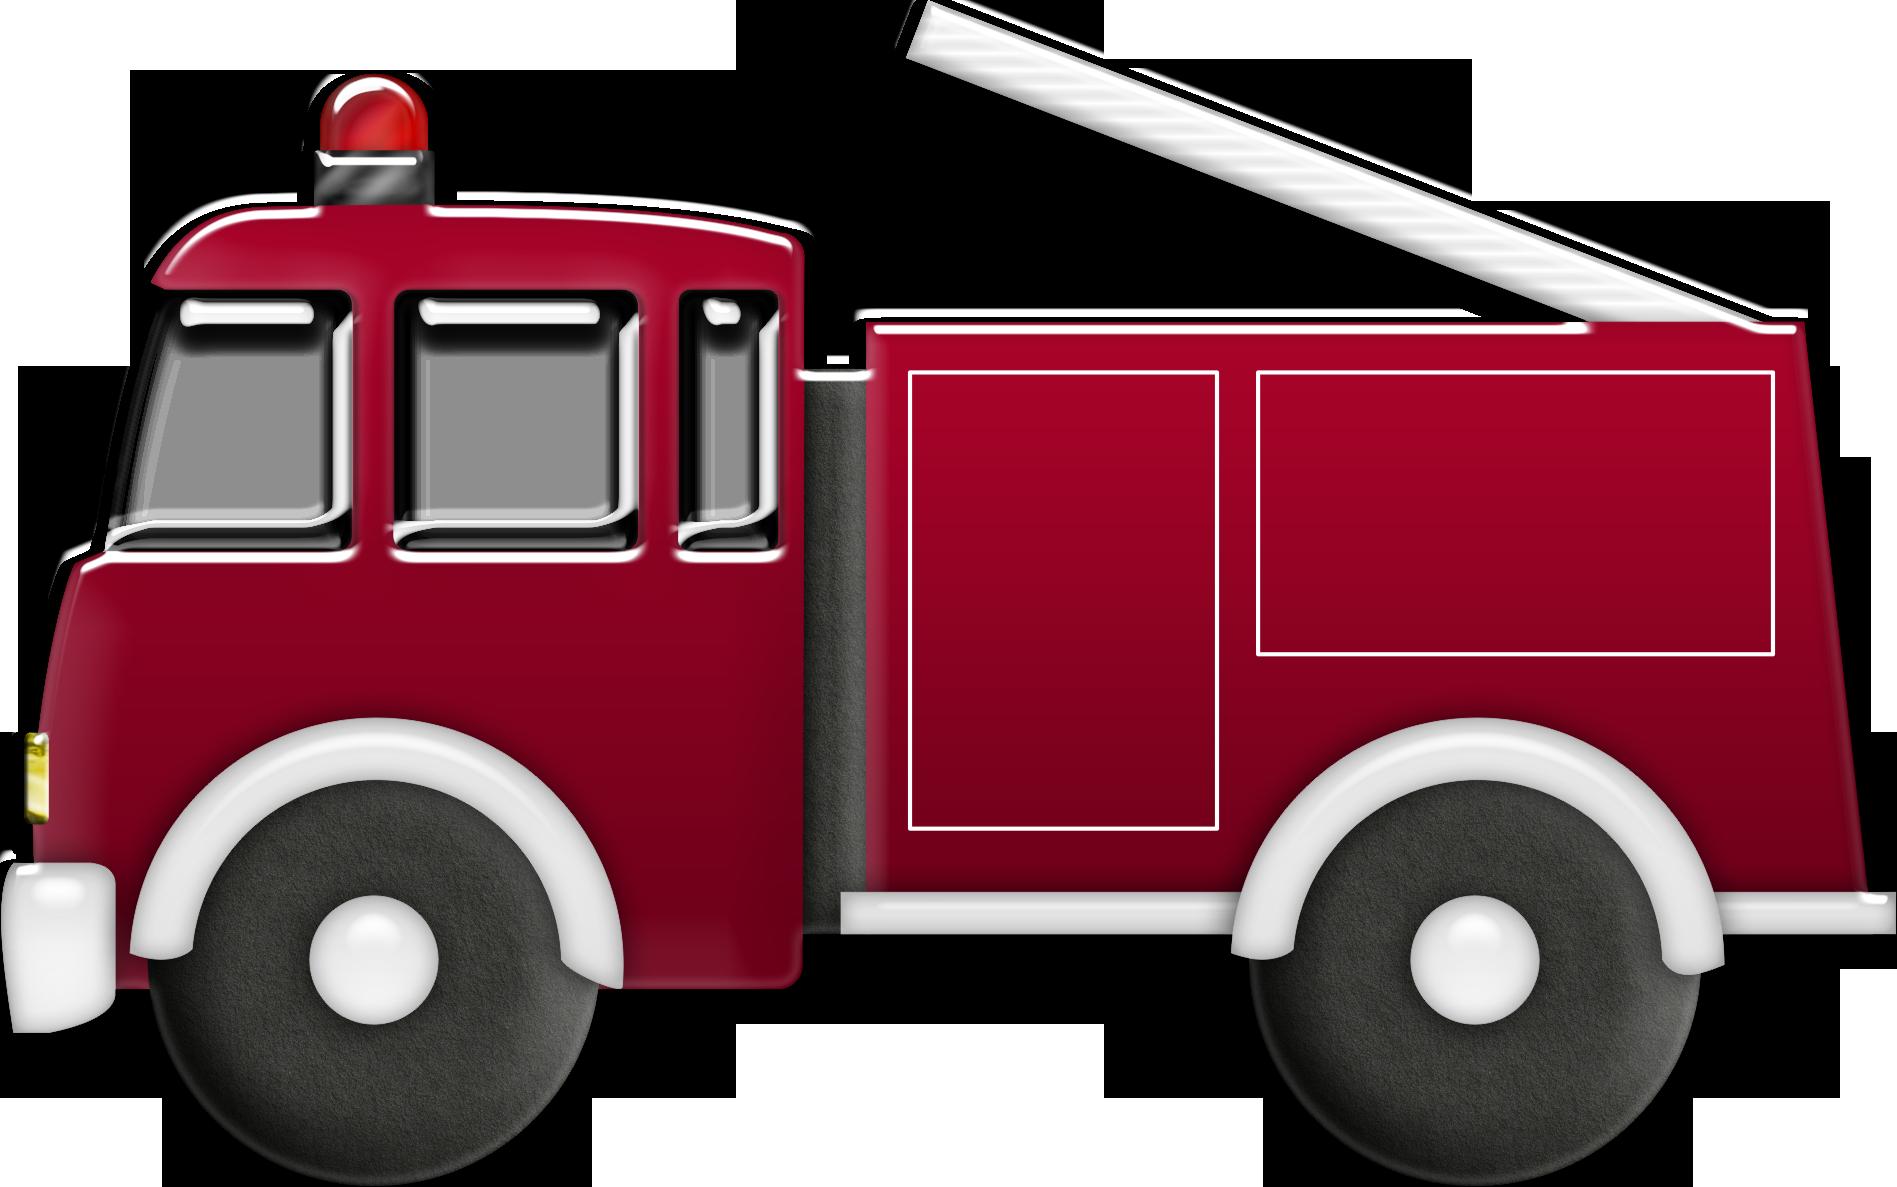 Car fire engine motor. Firetruck clipart old